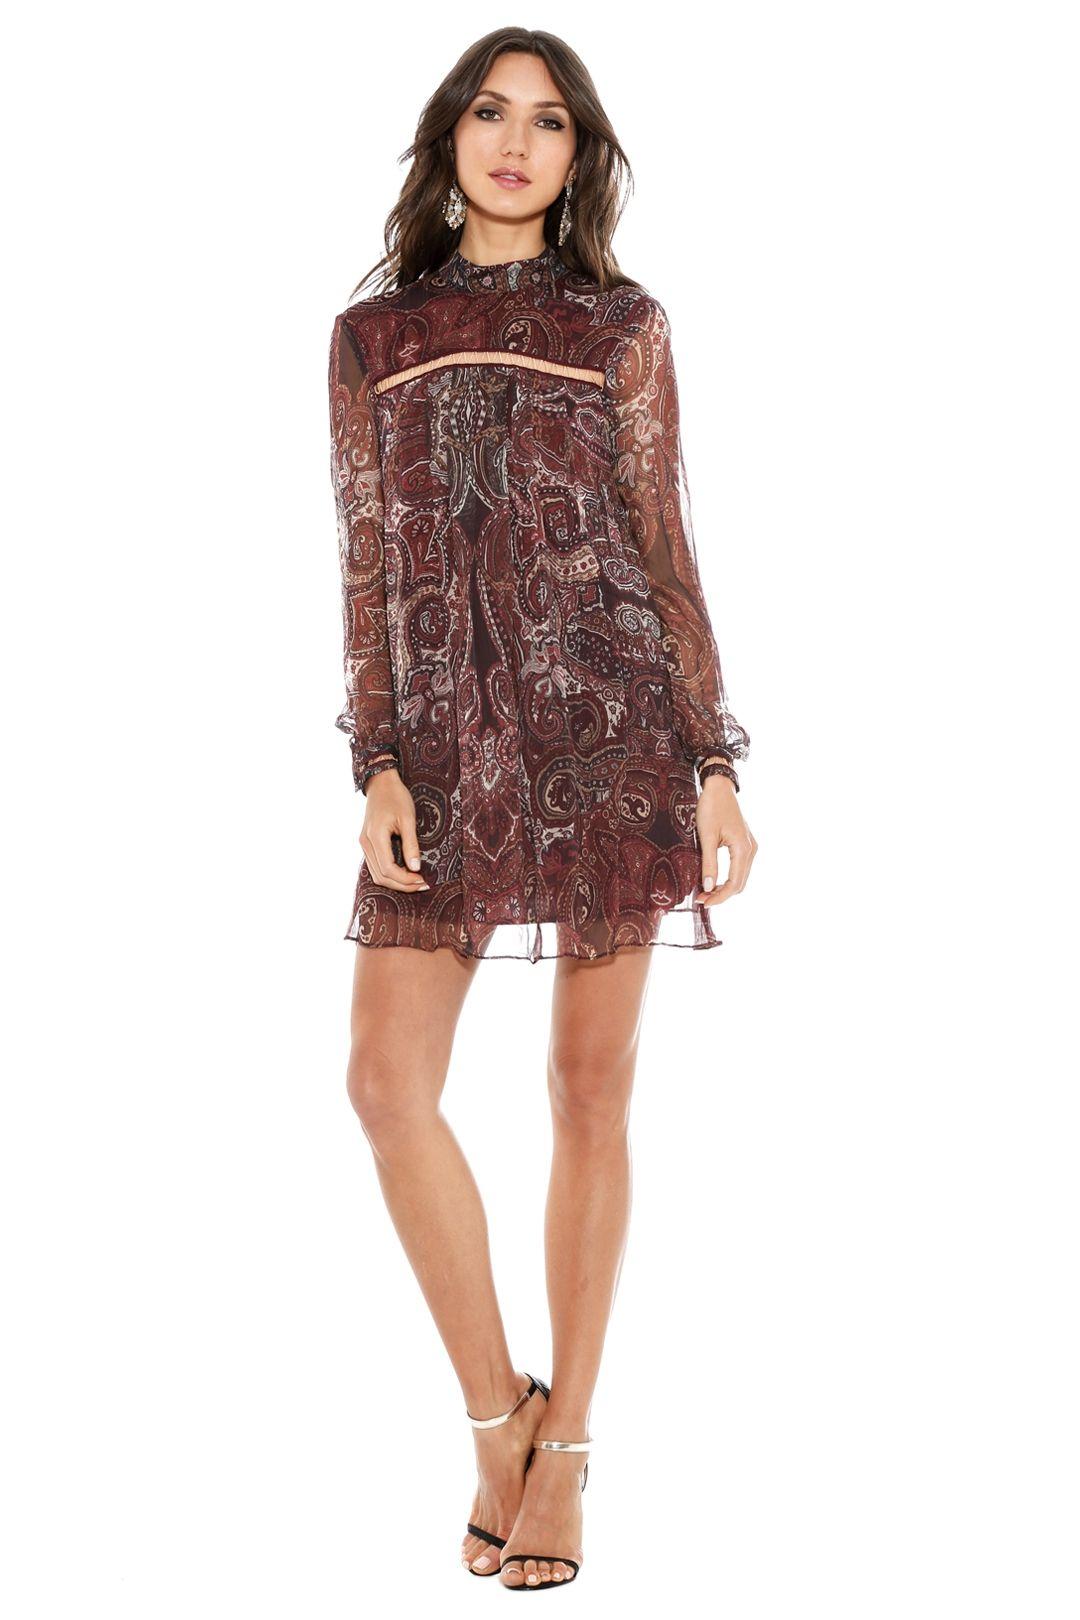 The Jetset Diaries - Labyrinth Paisley Mini Dress - Burgundy - Front